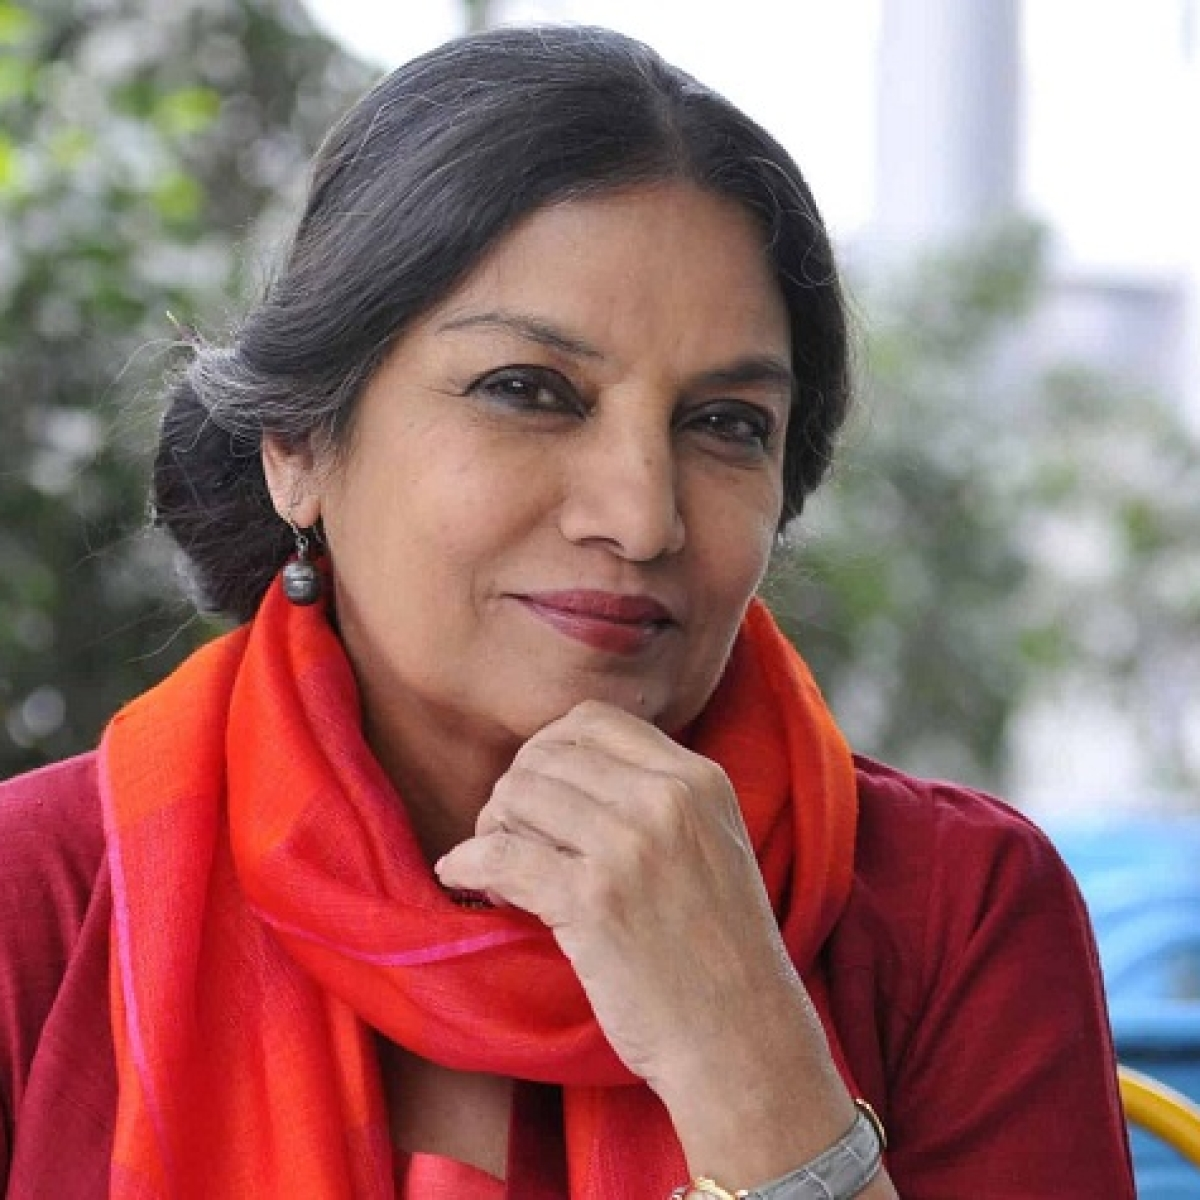 Shabana Azmi 70th birthday special: An actress-activist par excellence